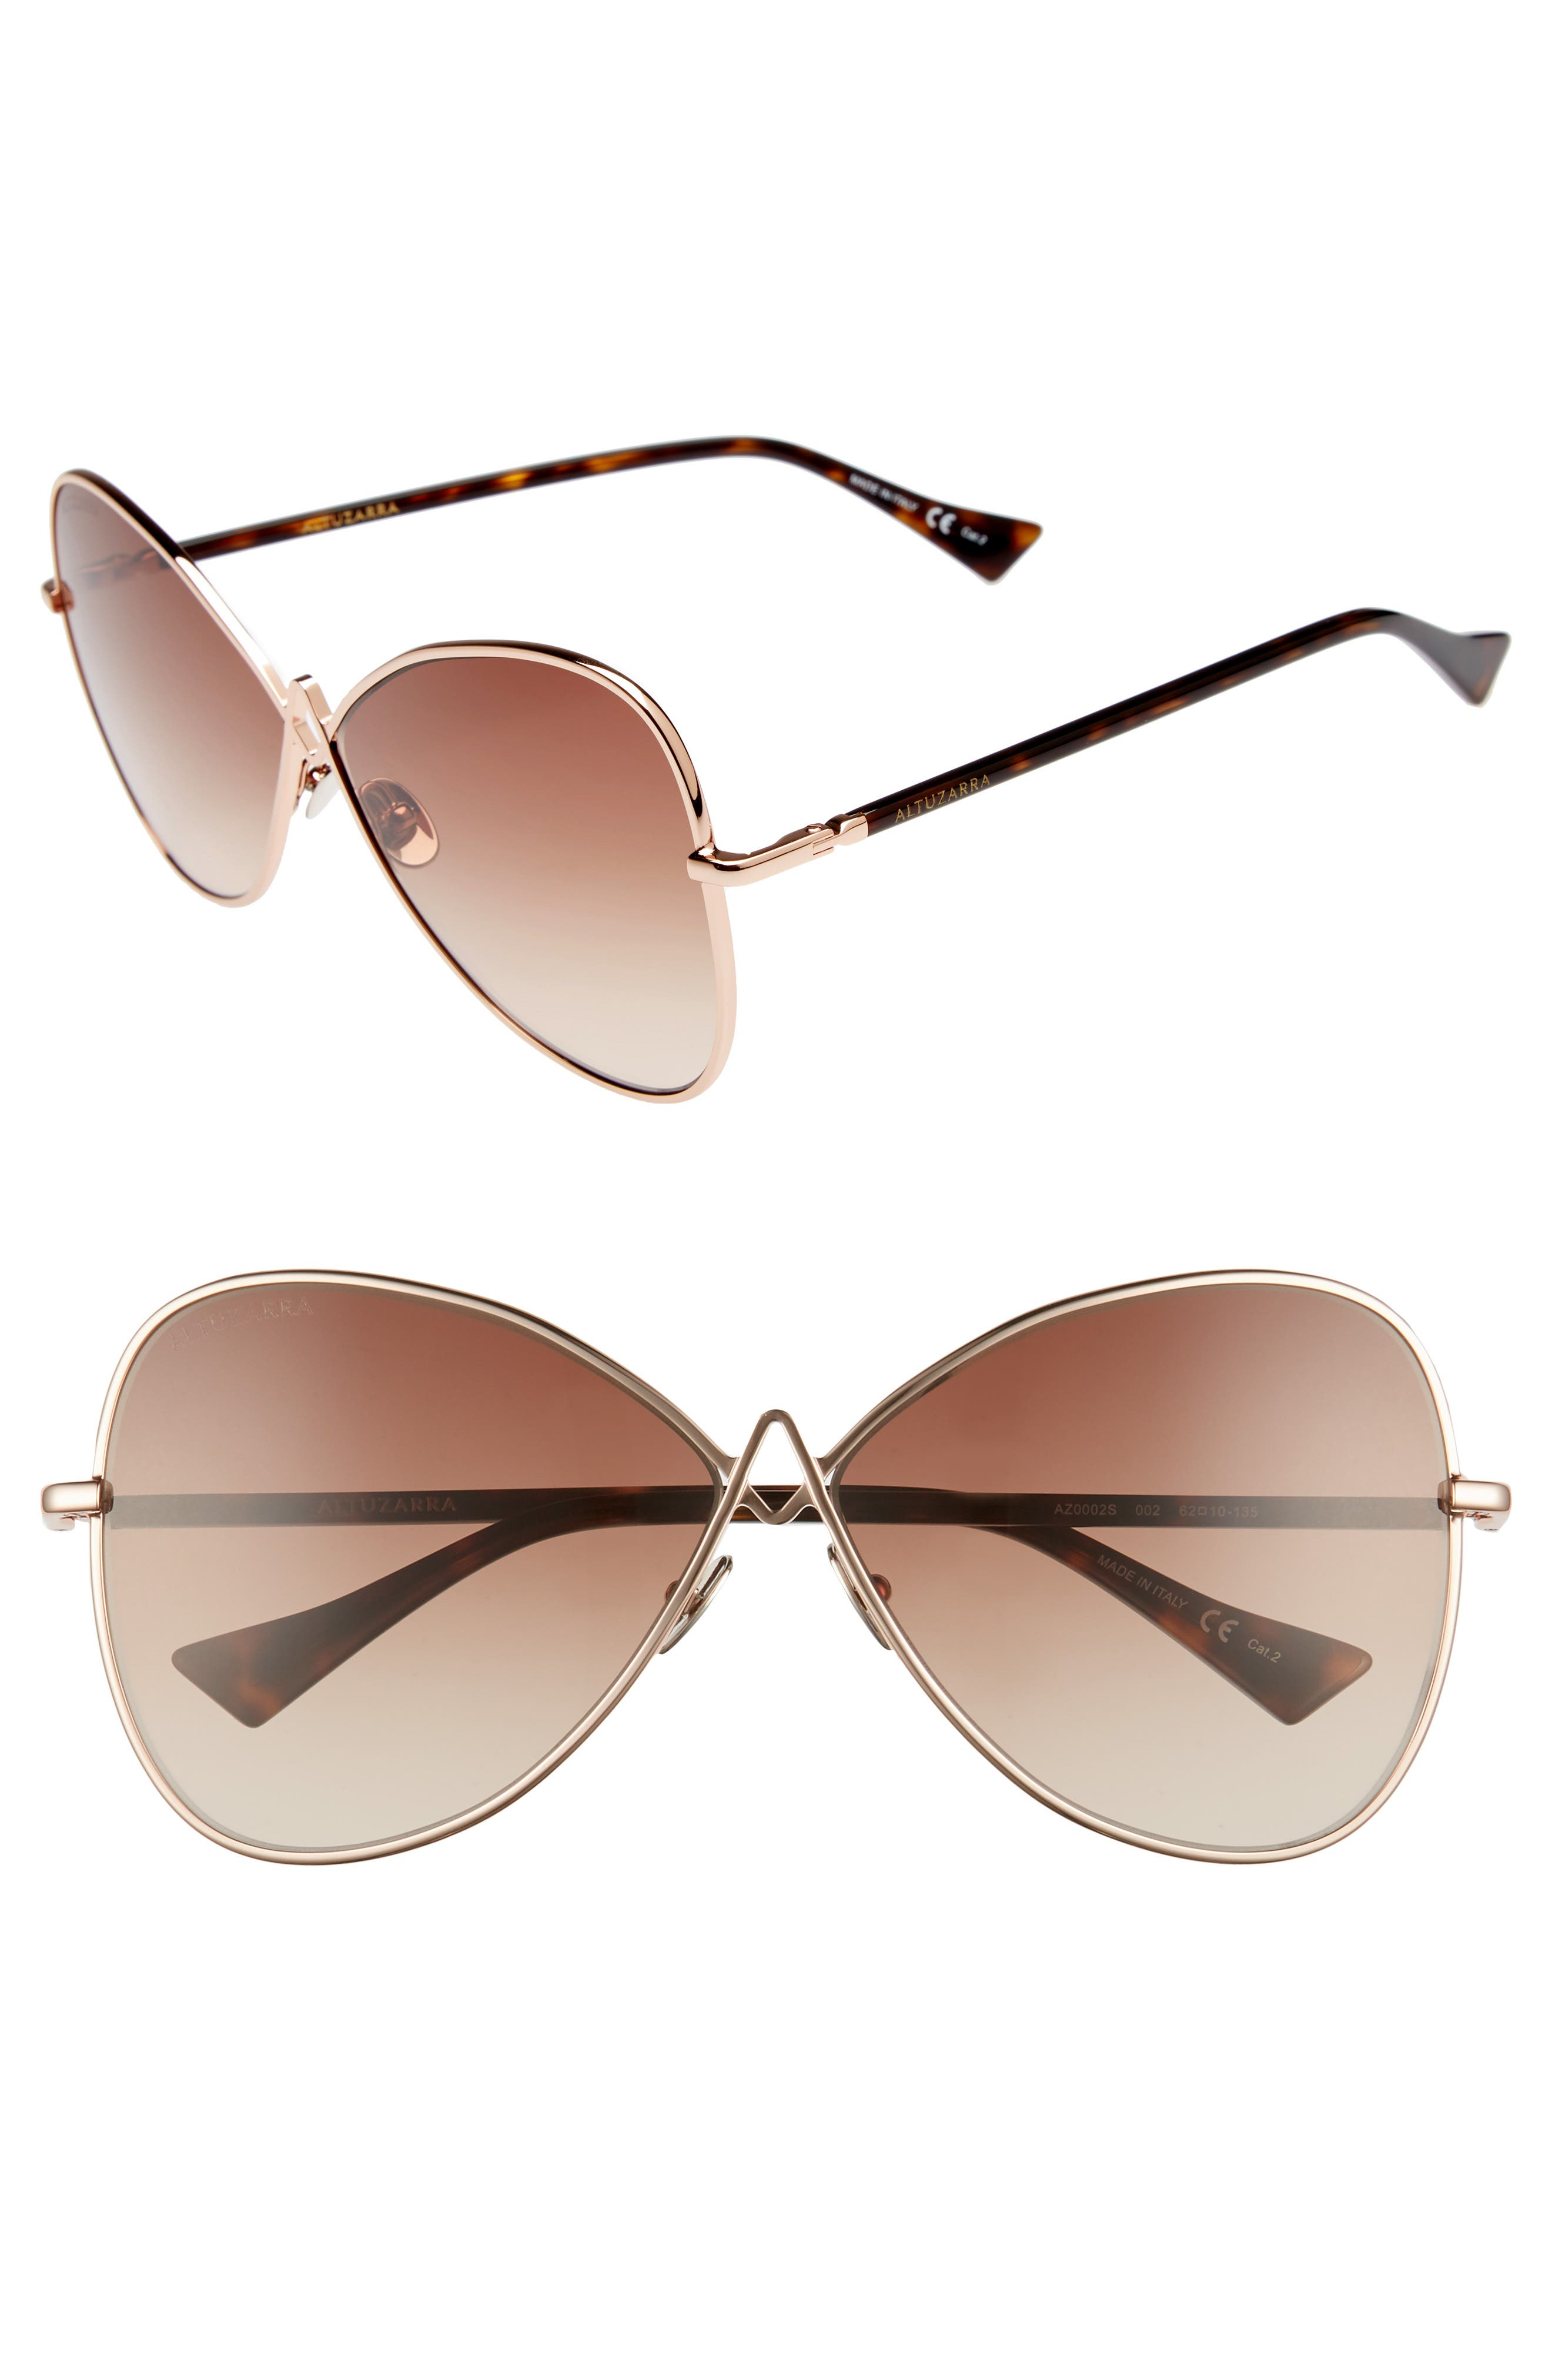 62mm Sunglasses,                             Main thumbnail 1, color,                             Rose Gold